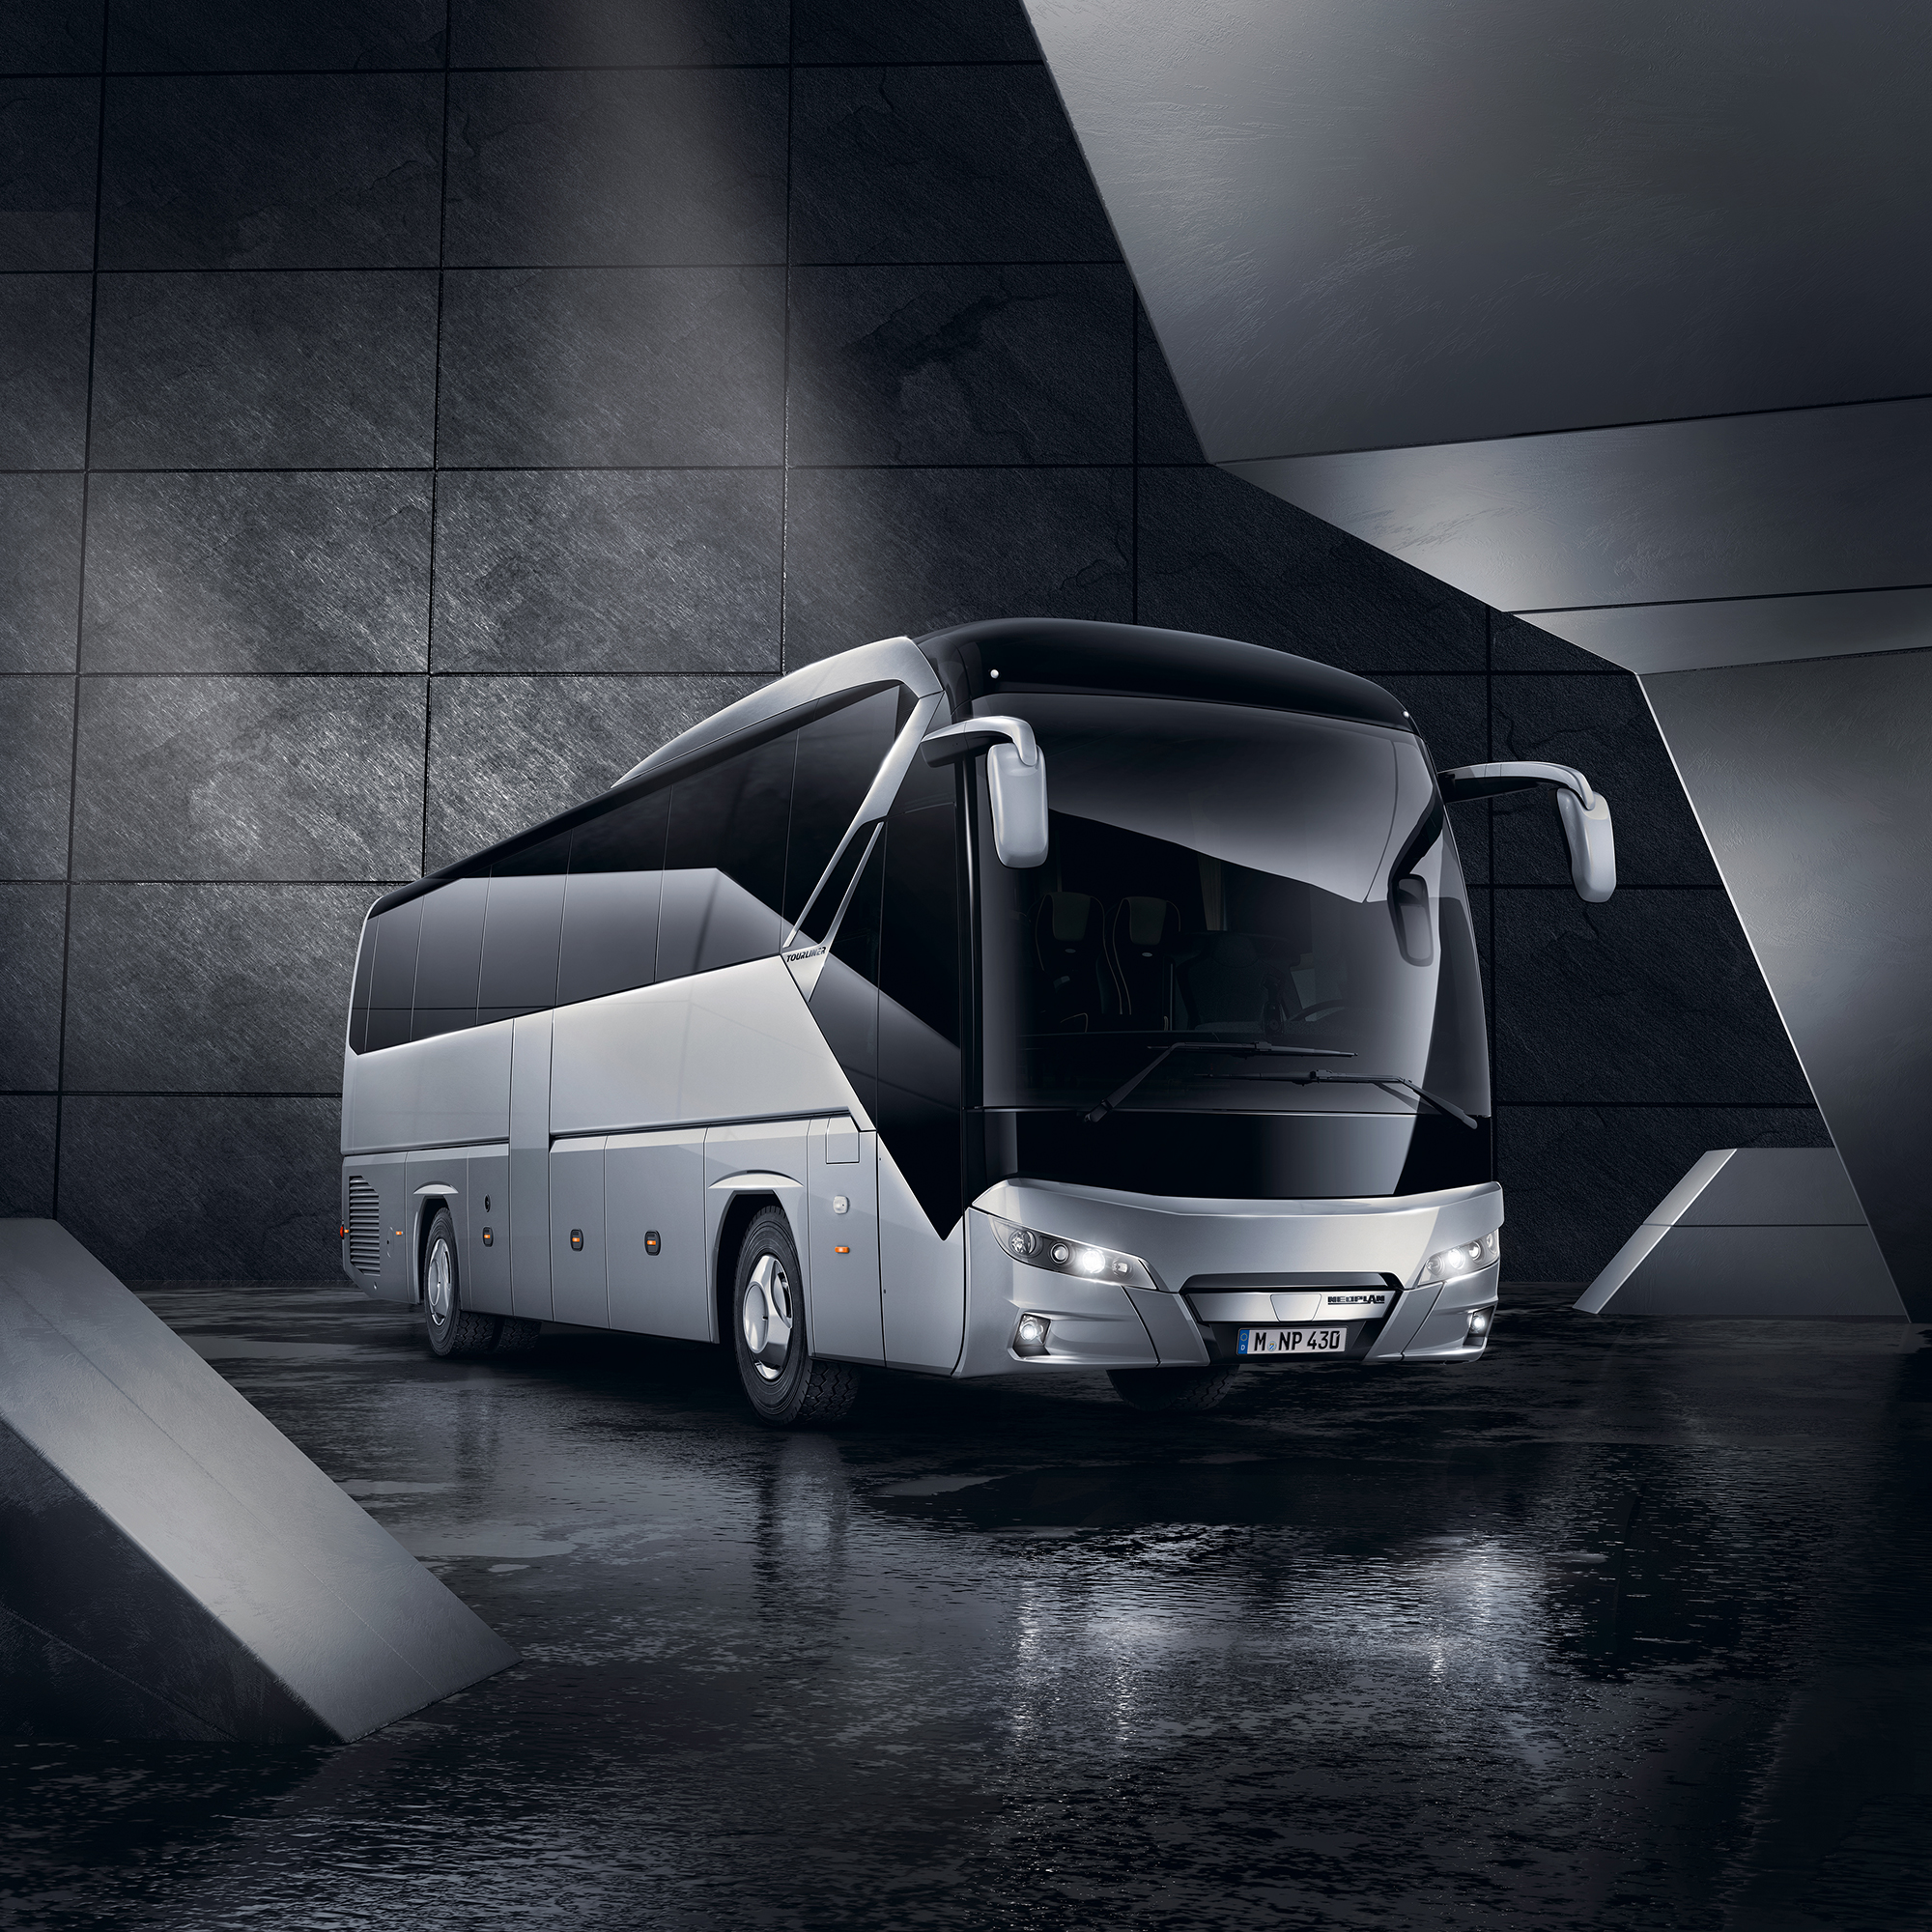 man_tourliner_-001.jpg